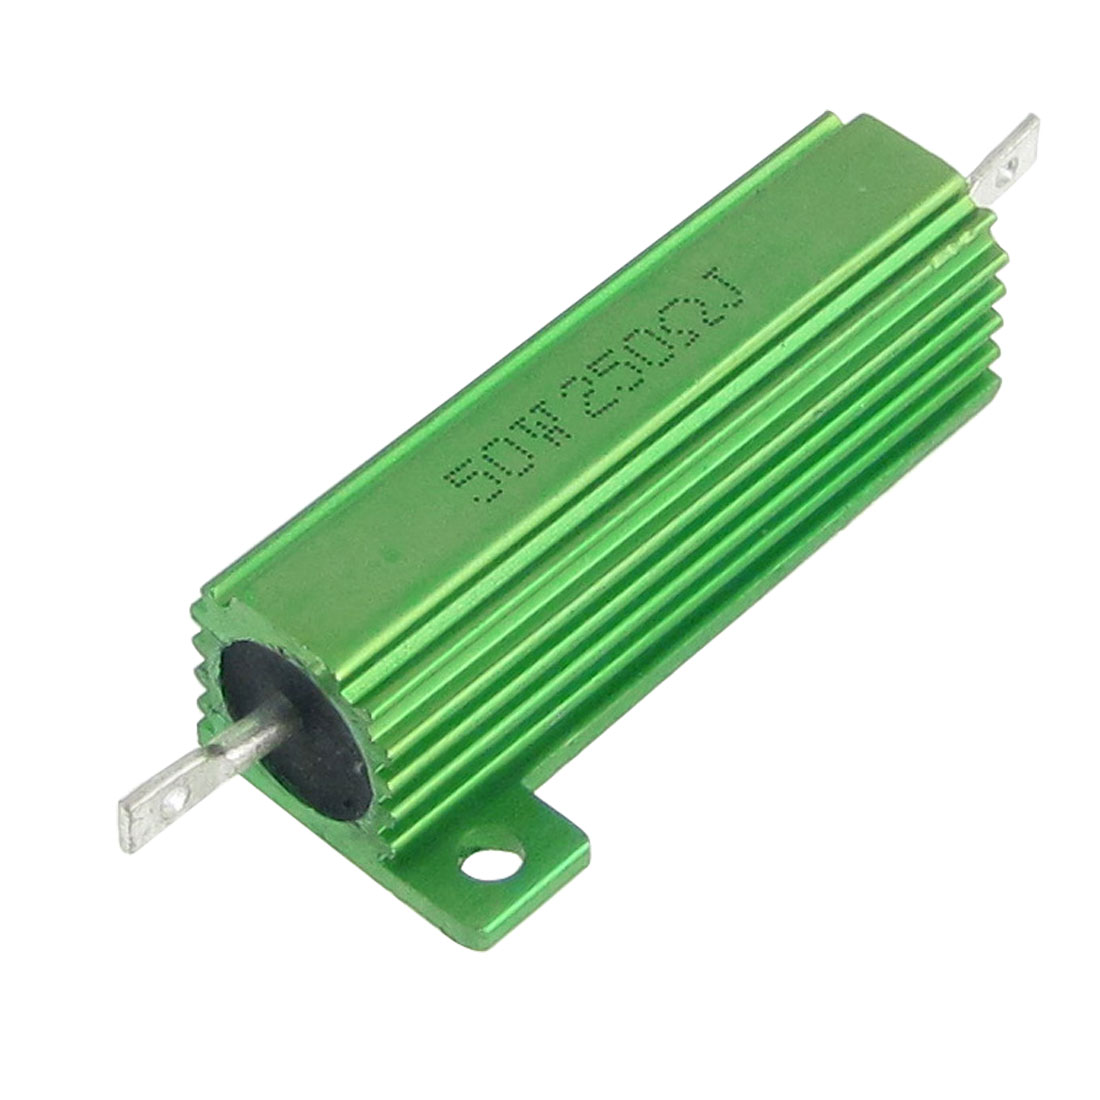 Green Aluminum Case Wire Wound 50W 5% 250 Ohm Resistors 2 Pcs